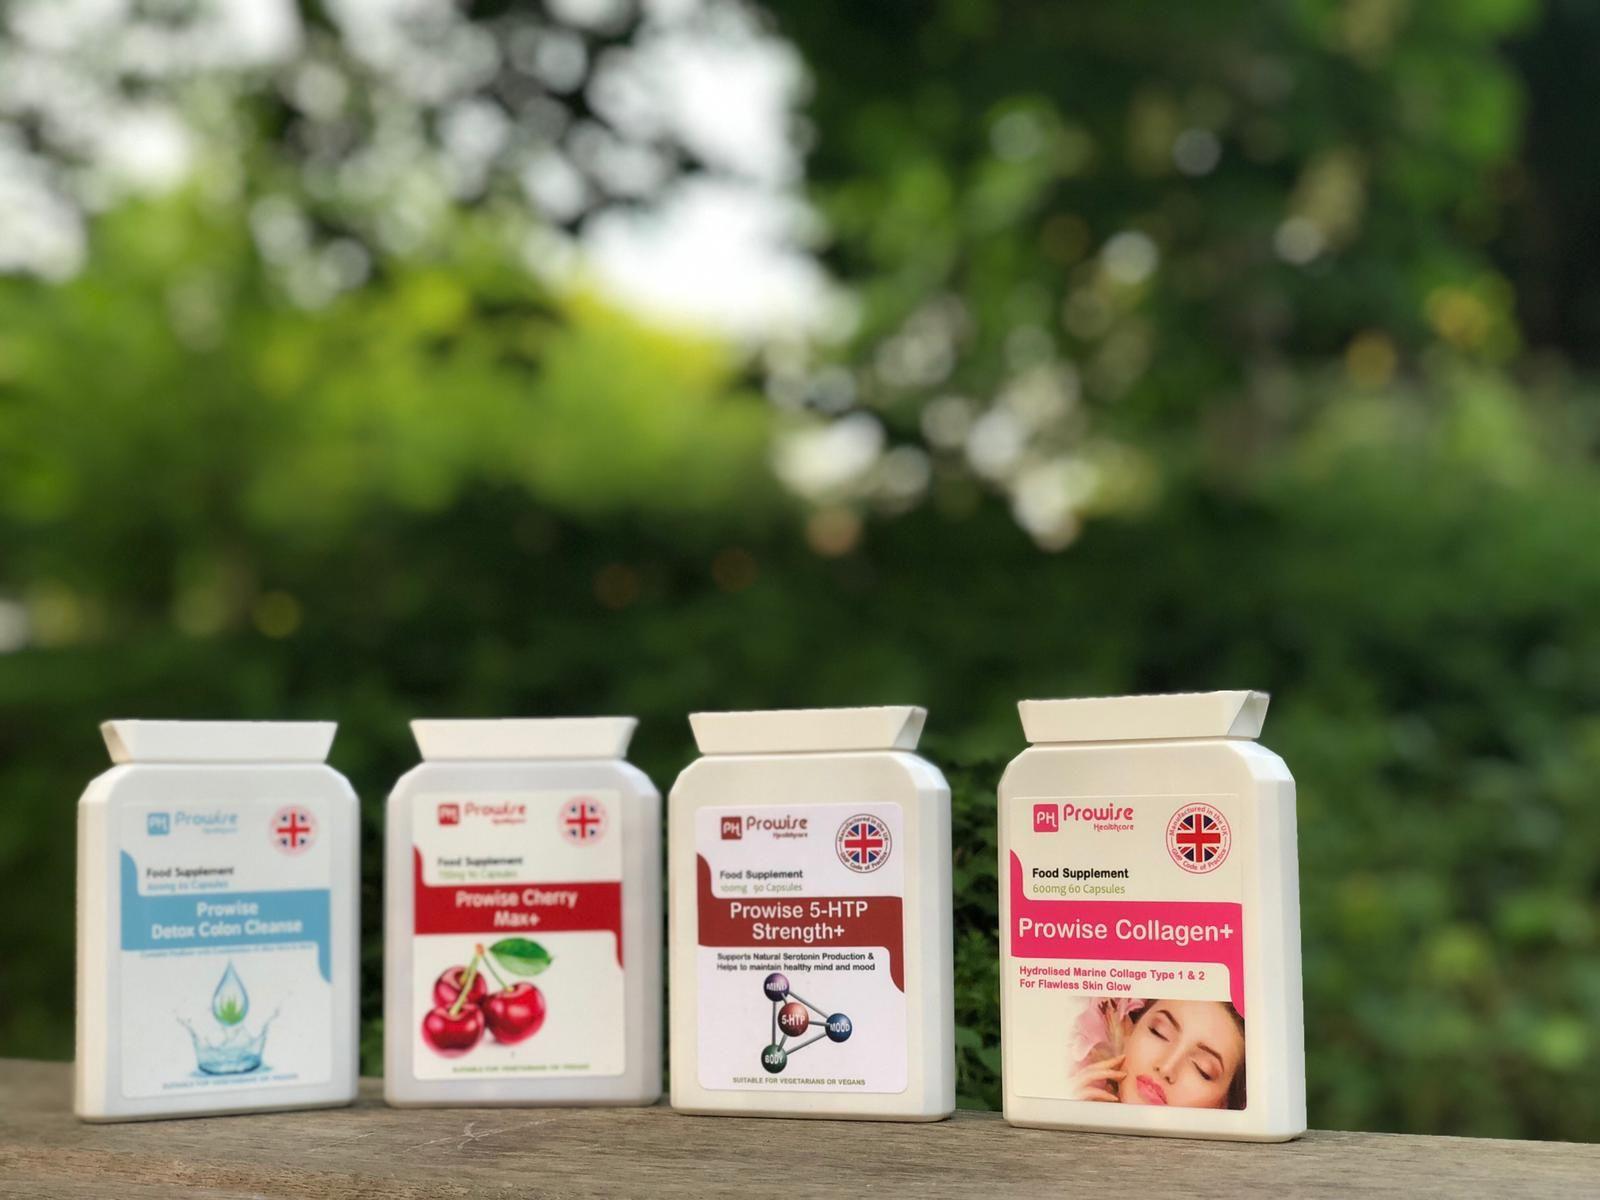 Best Prescription Weight Loss Pills 2019 Prowise Weightloss Supplements medically proven weight loss